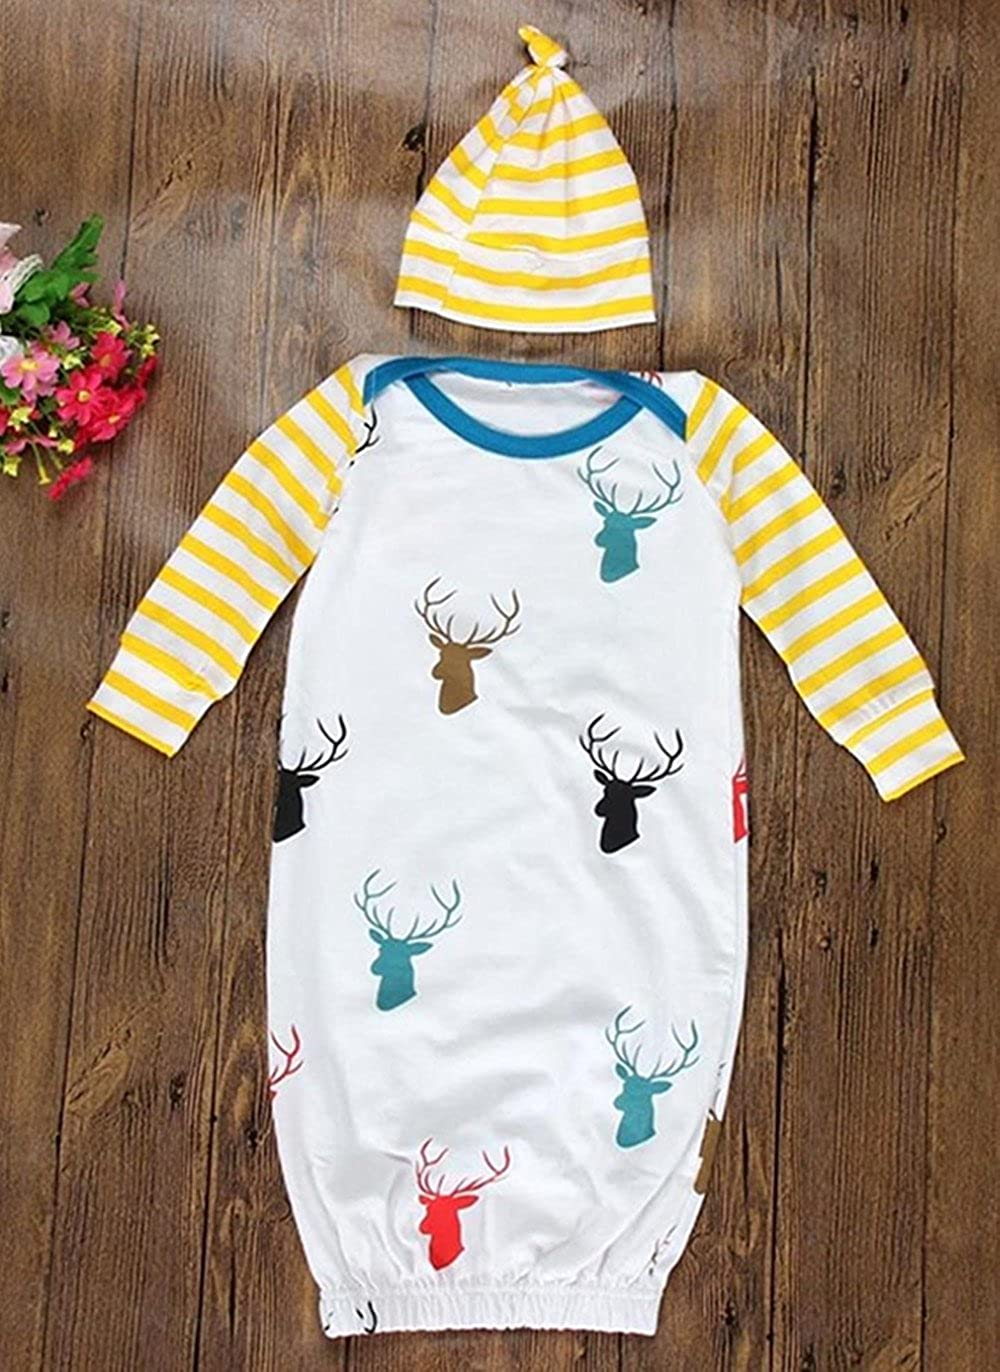 Amazon.com: Bebé recién nacido venir al hogar traje a rayas ...